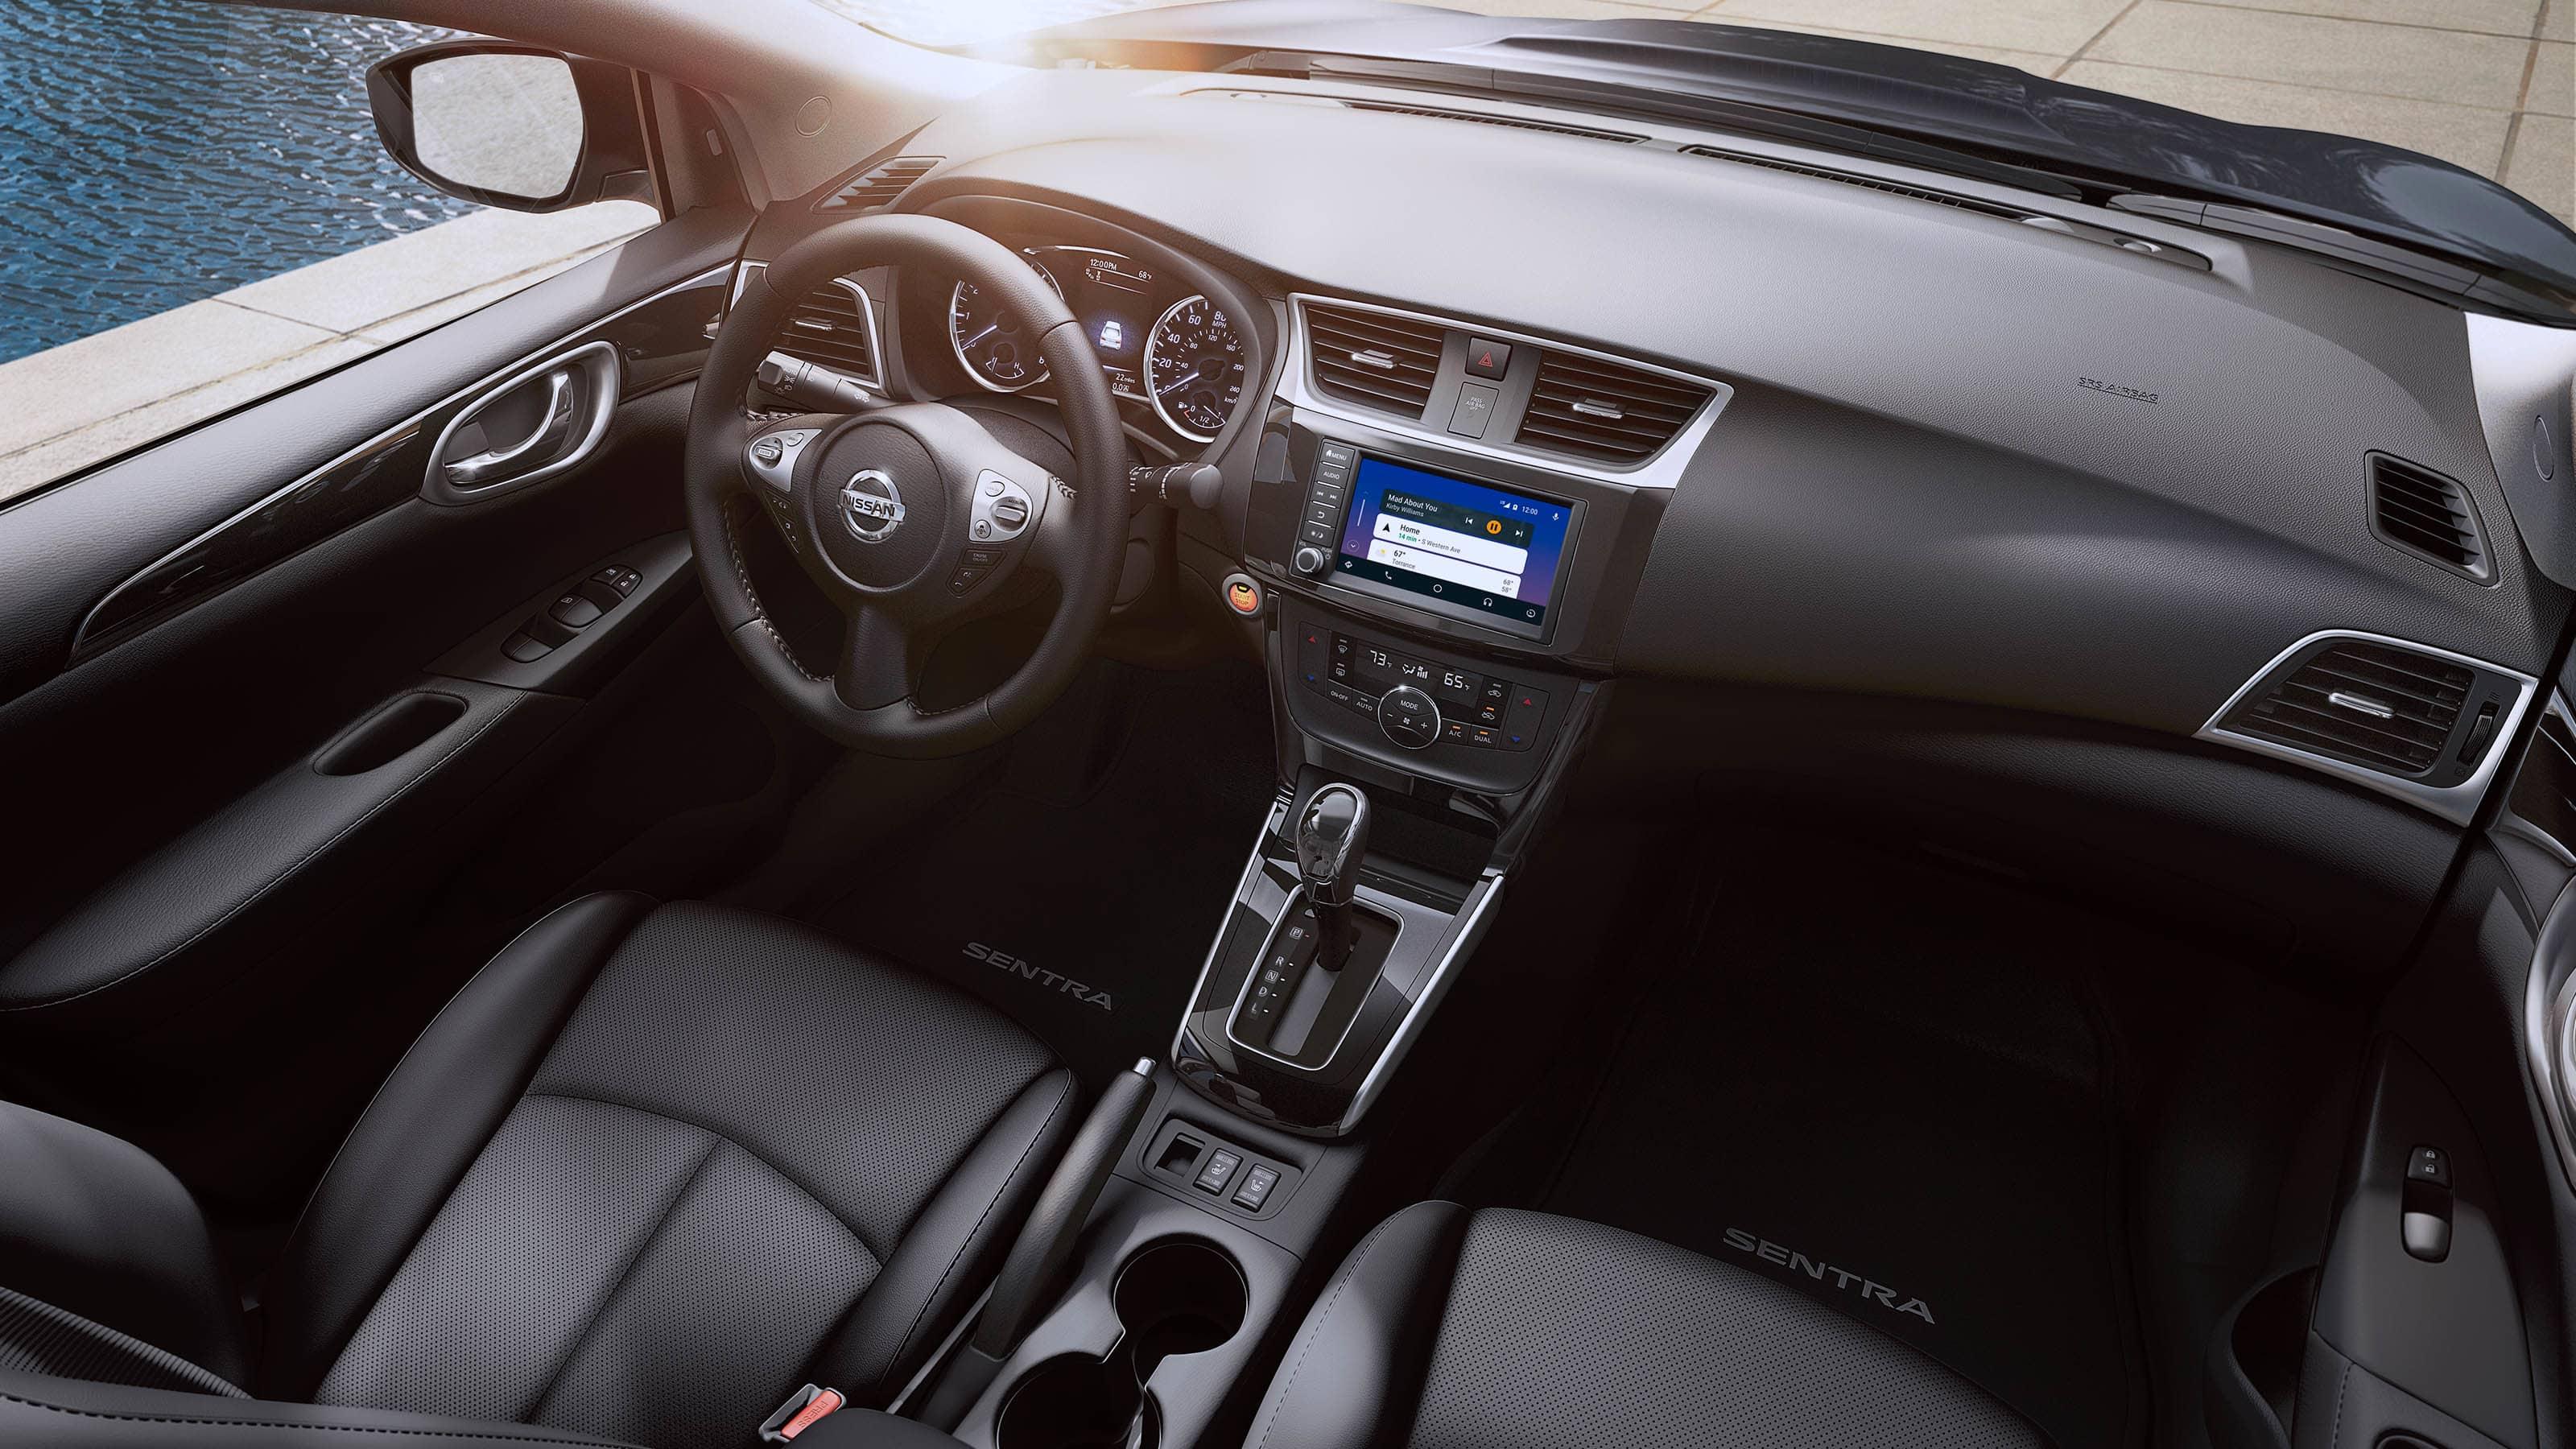 2019 Nissan Sentra Cockpit